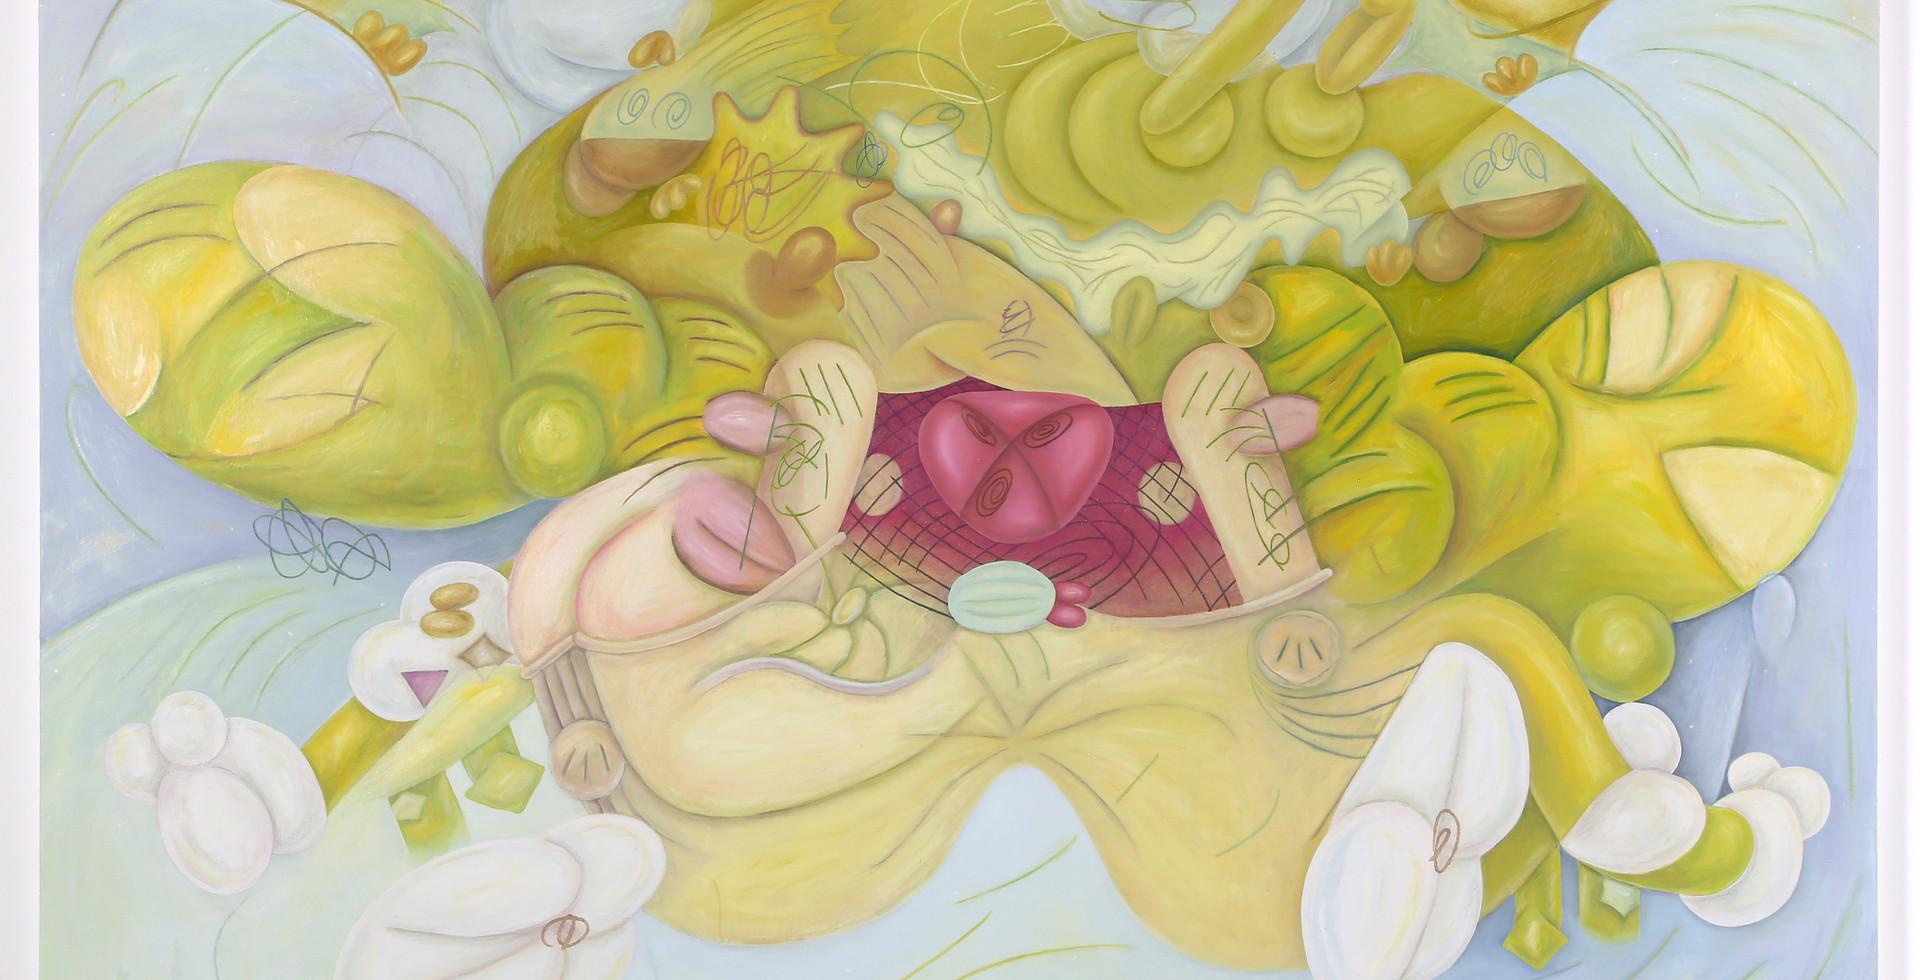 """New-laid eggs vol.3""      Minami Kobayashi|Miki Fukagawa"